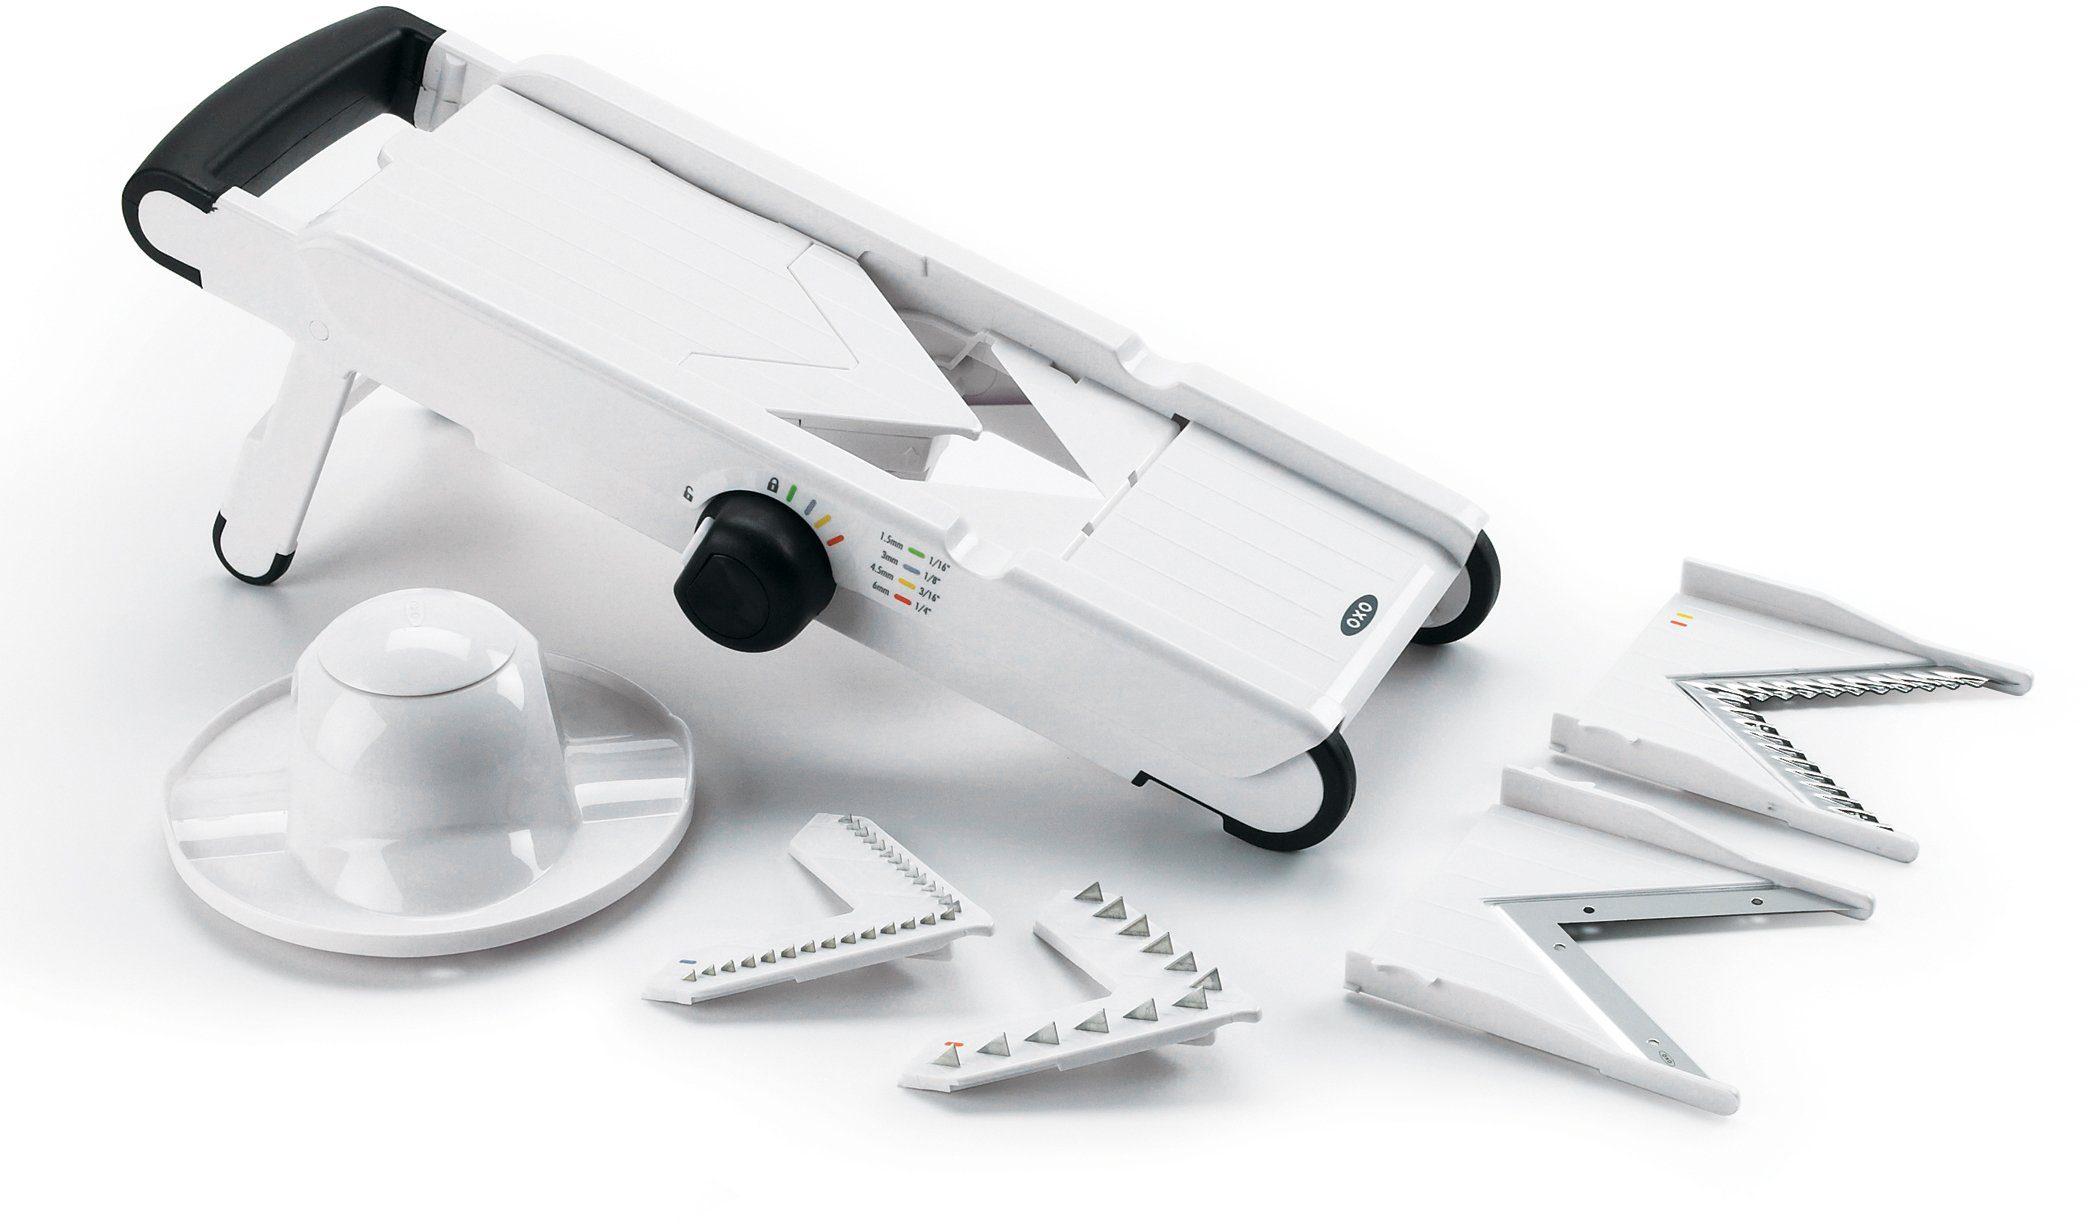 OXO Mandolinenschneider mit V-Klinge